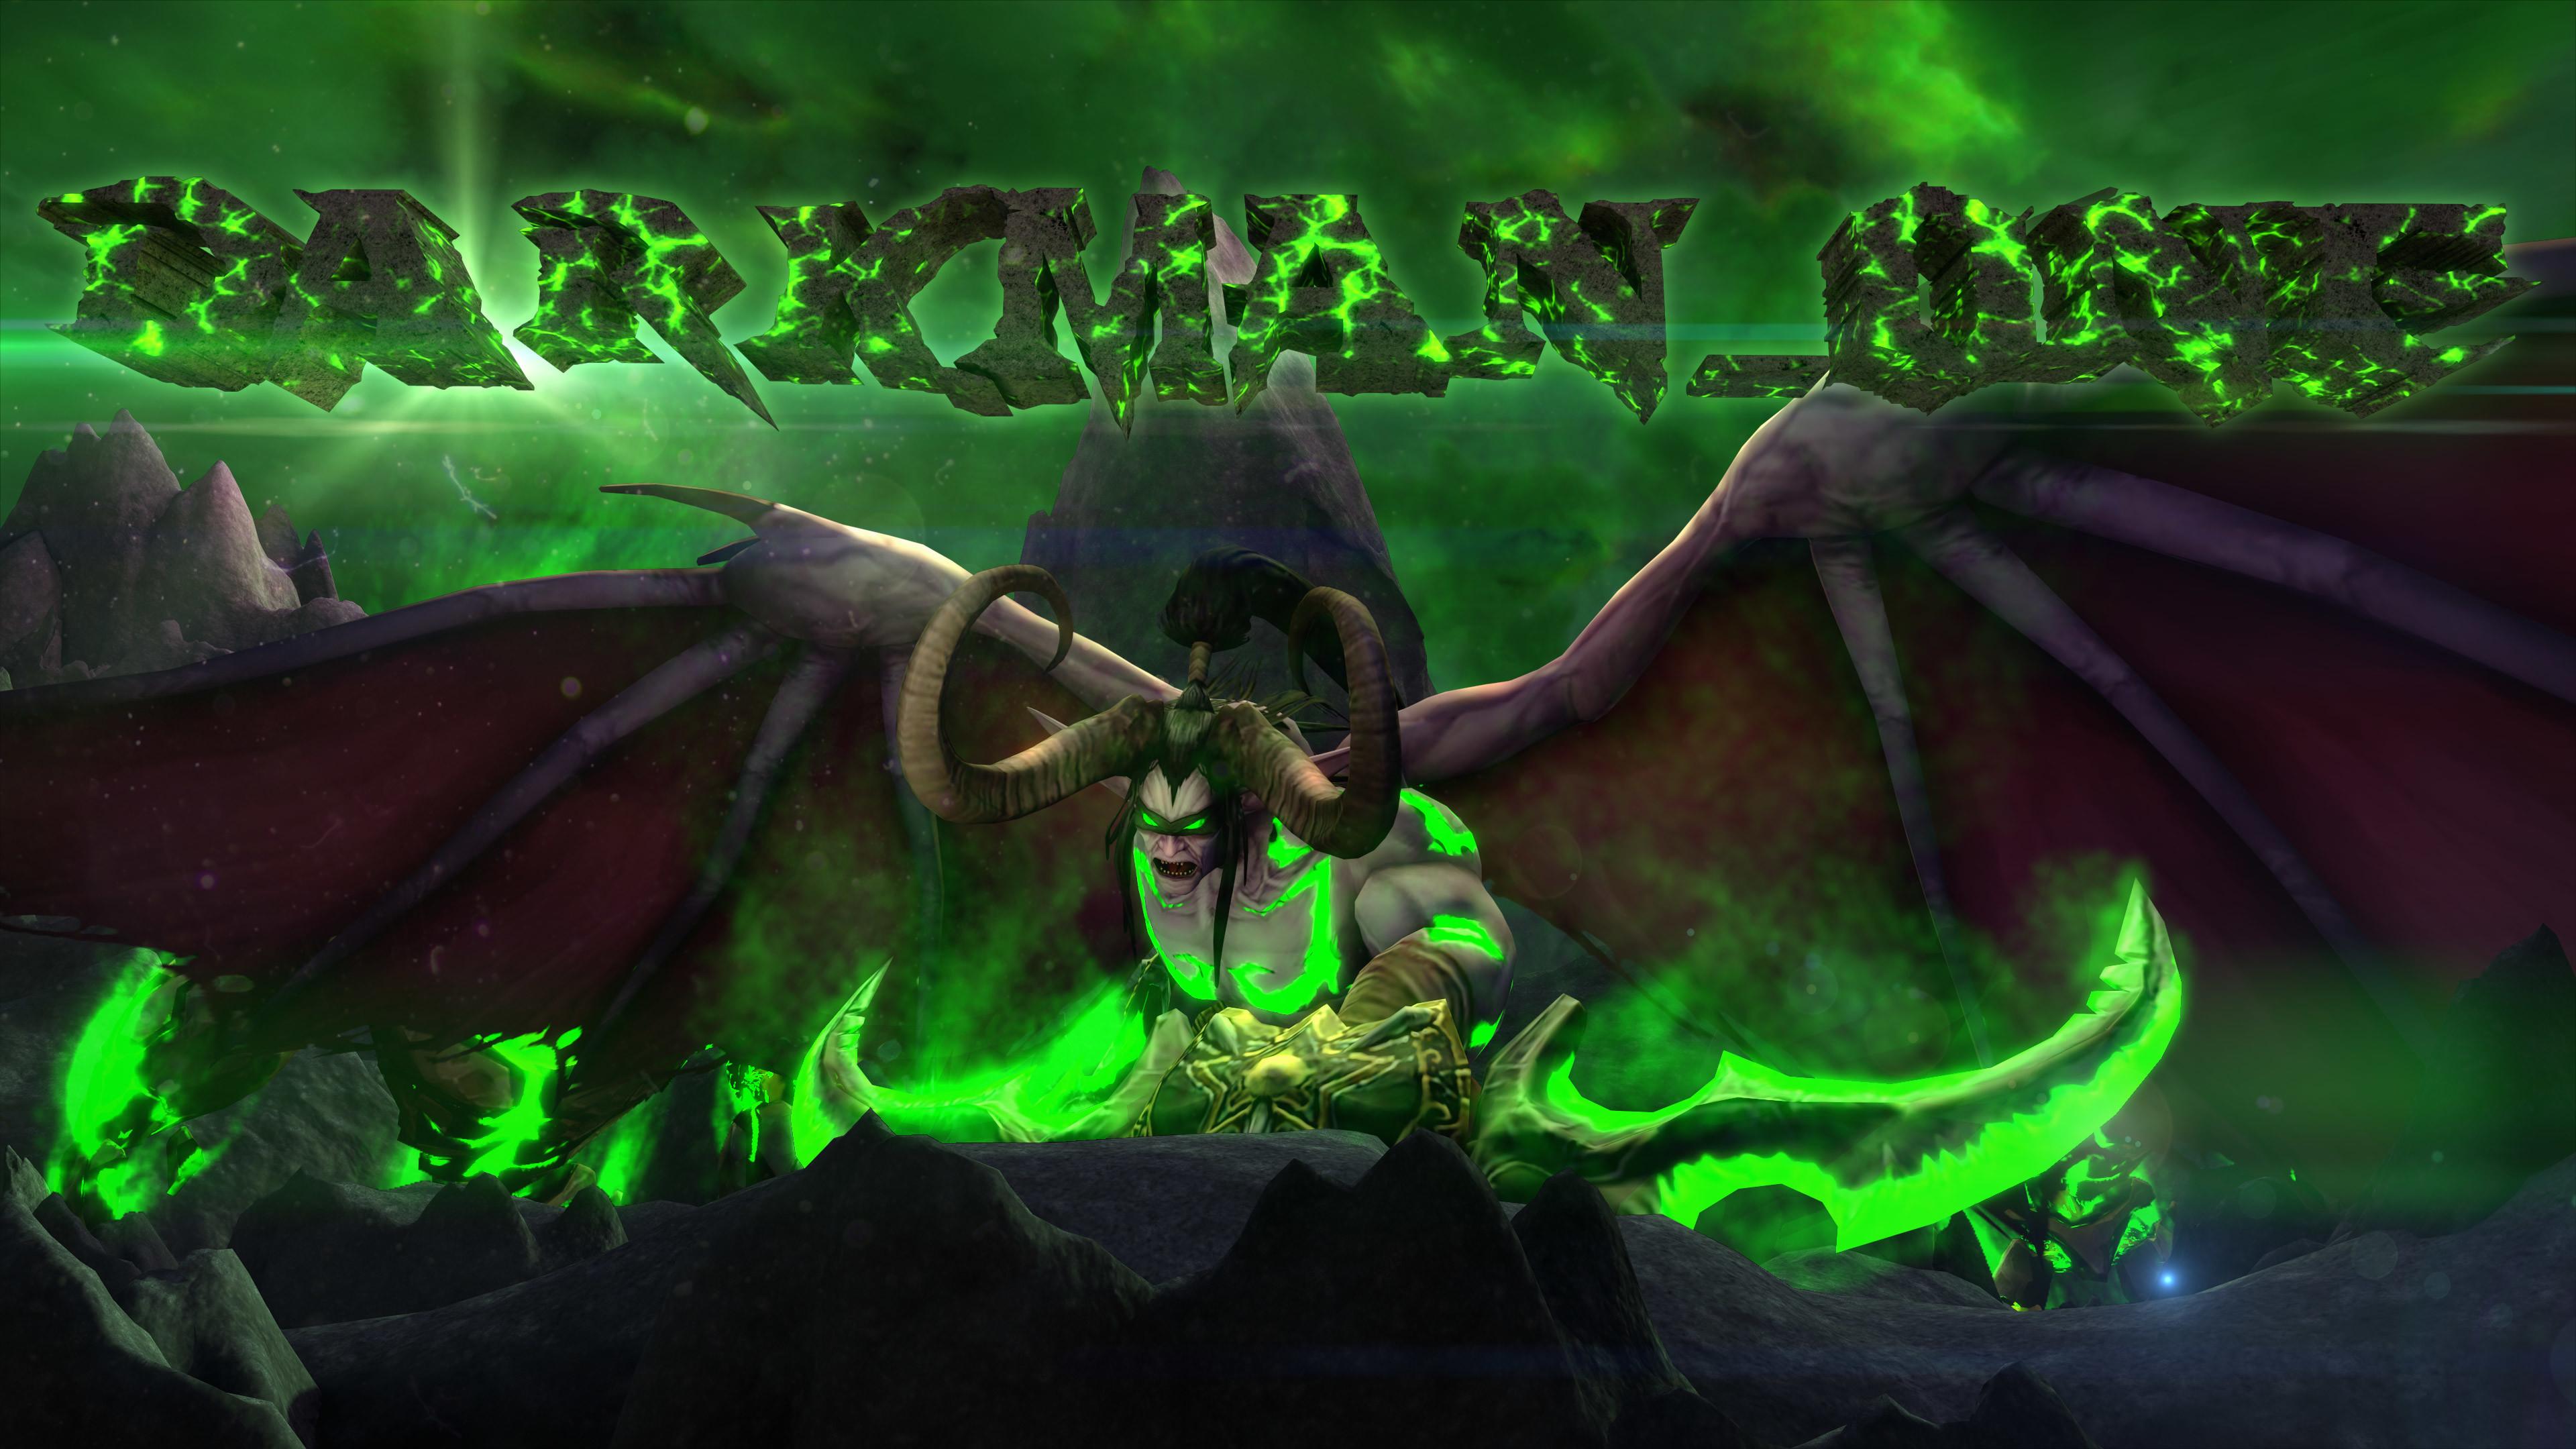 4K_Legion_Illidan_Wallpaper_by_Psynaps  Darkman_4K_Legion_Illidan_Wallpaper_by_Psynaps_web